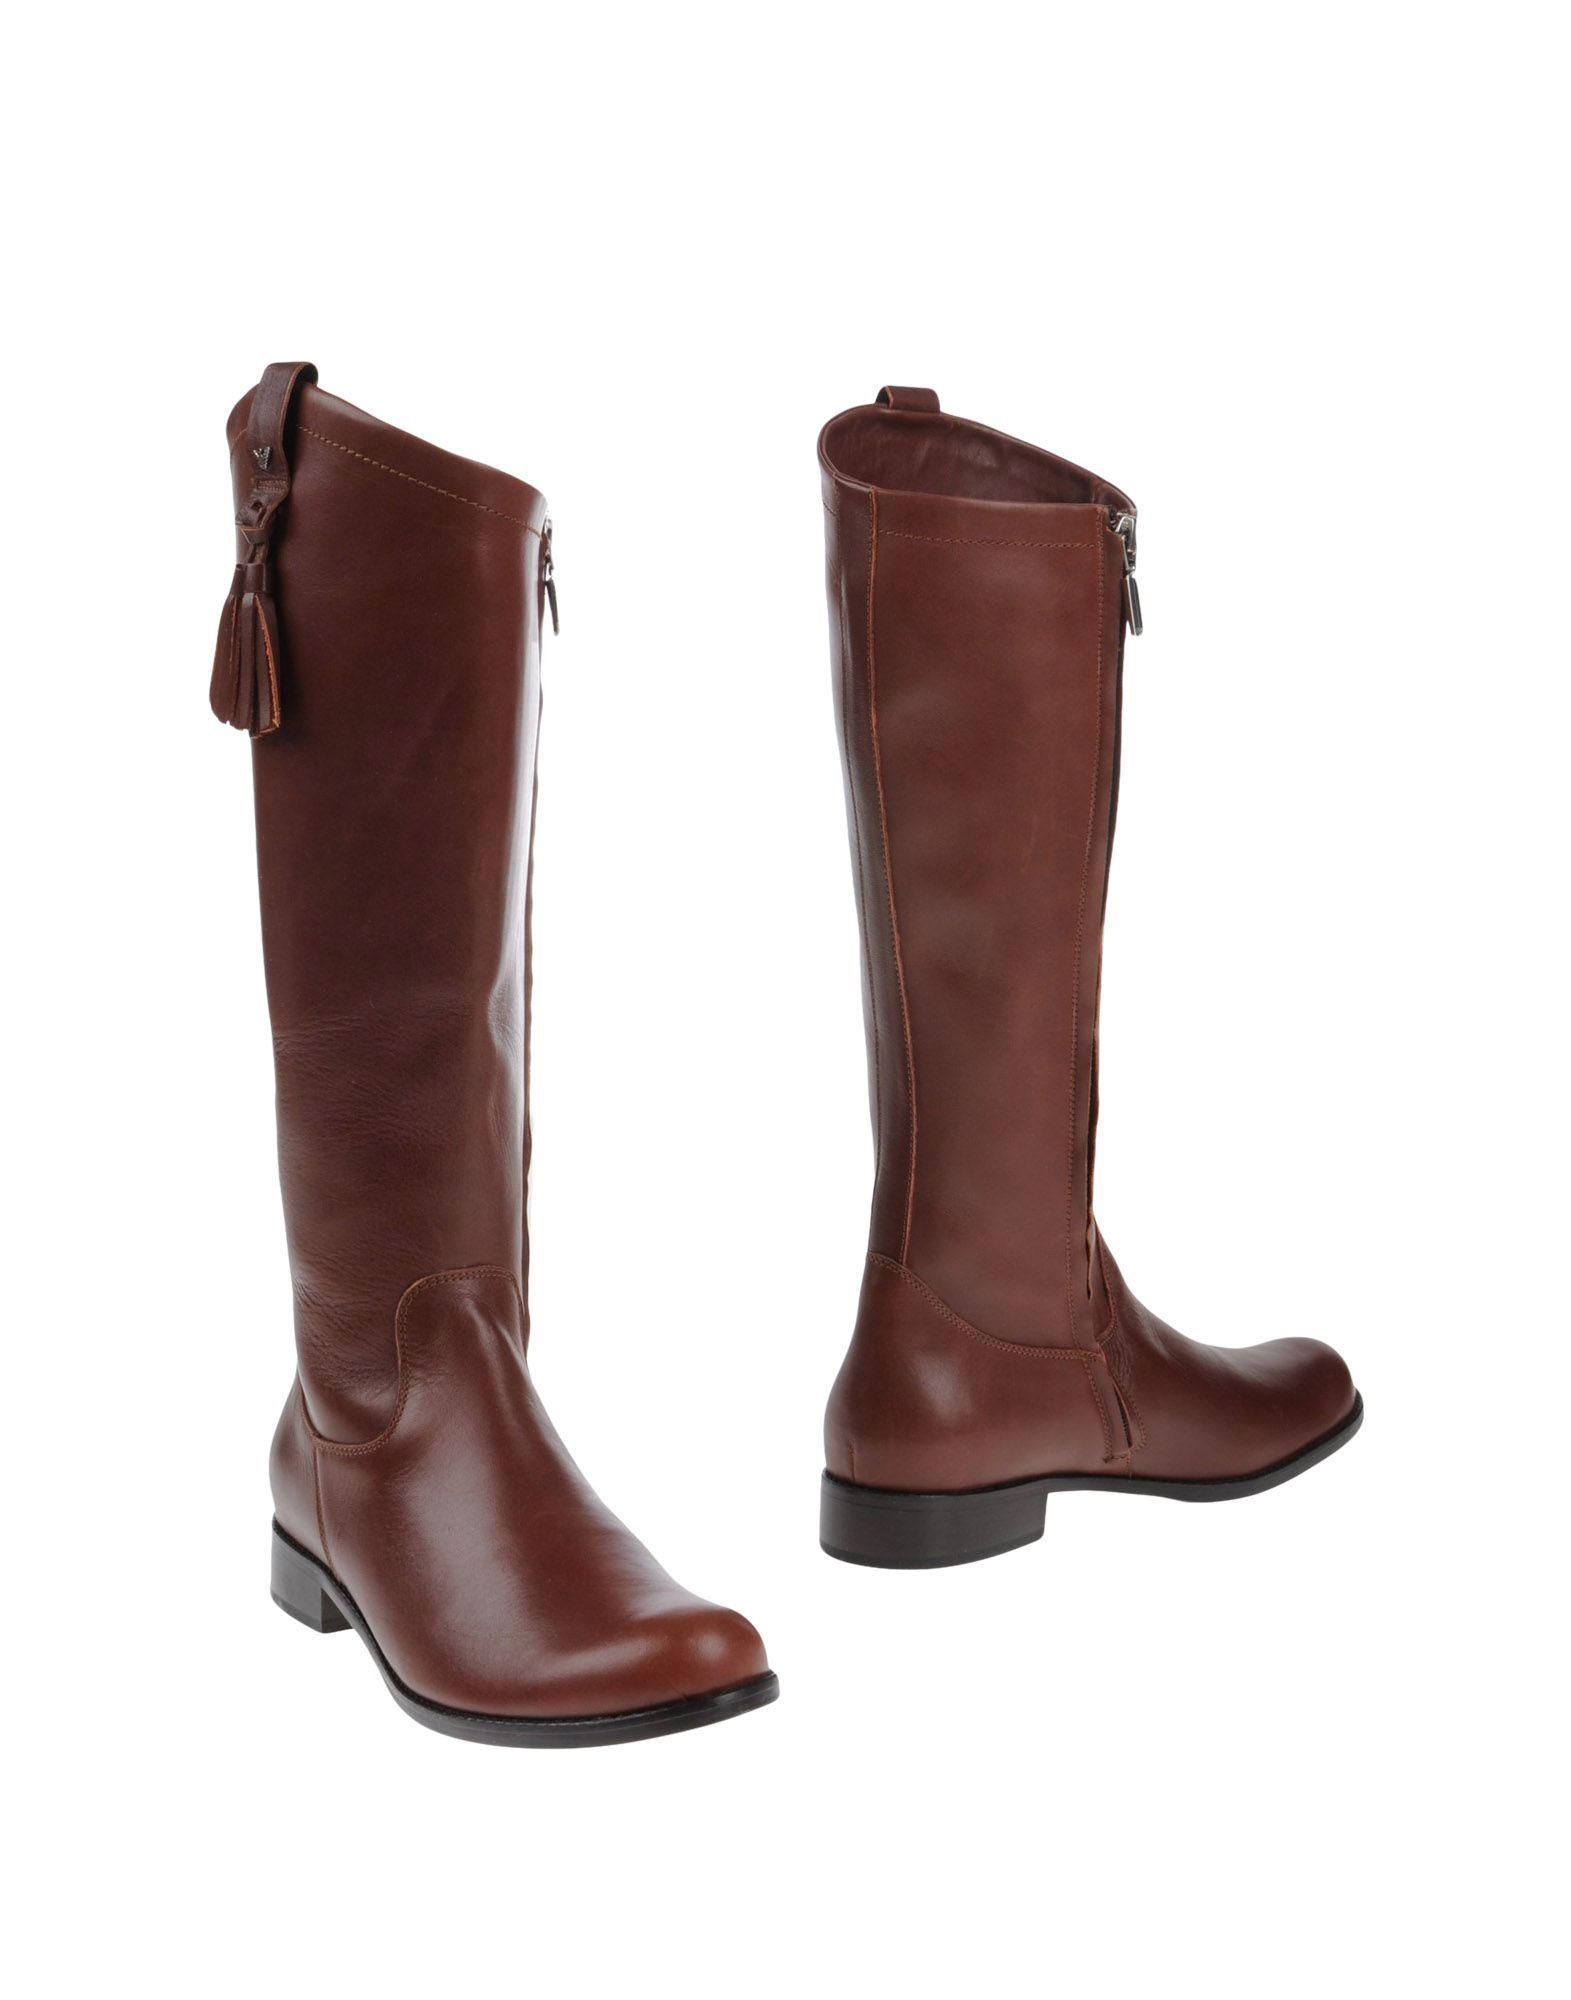 FOOTWEAR Armani Junior Cocoa Girl Leather